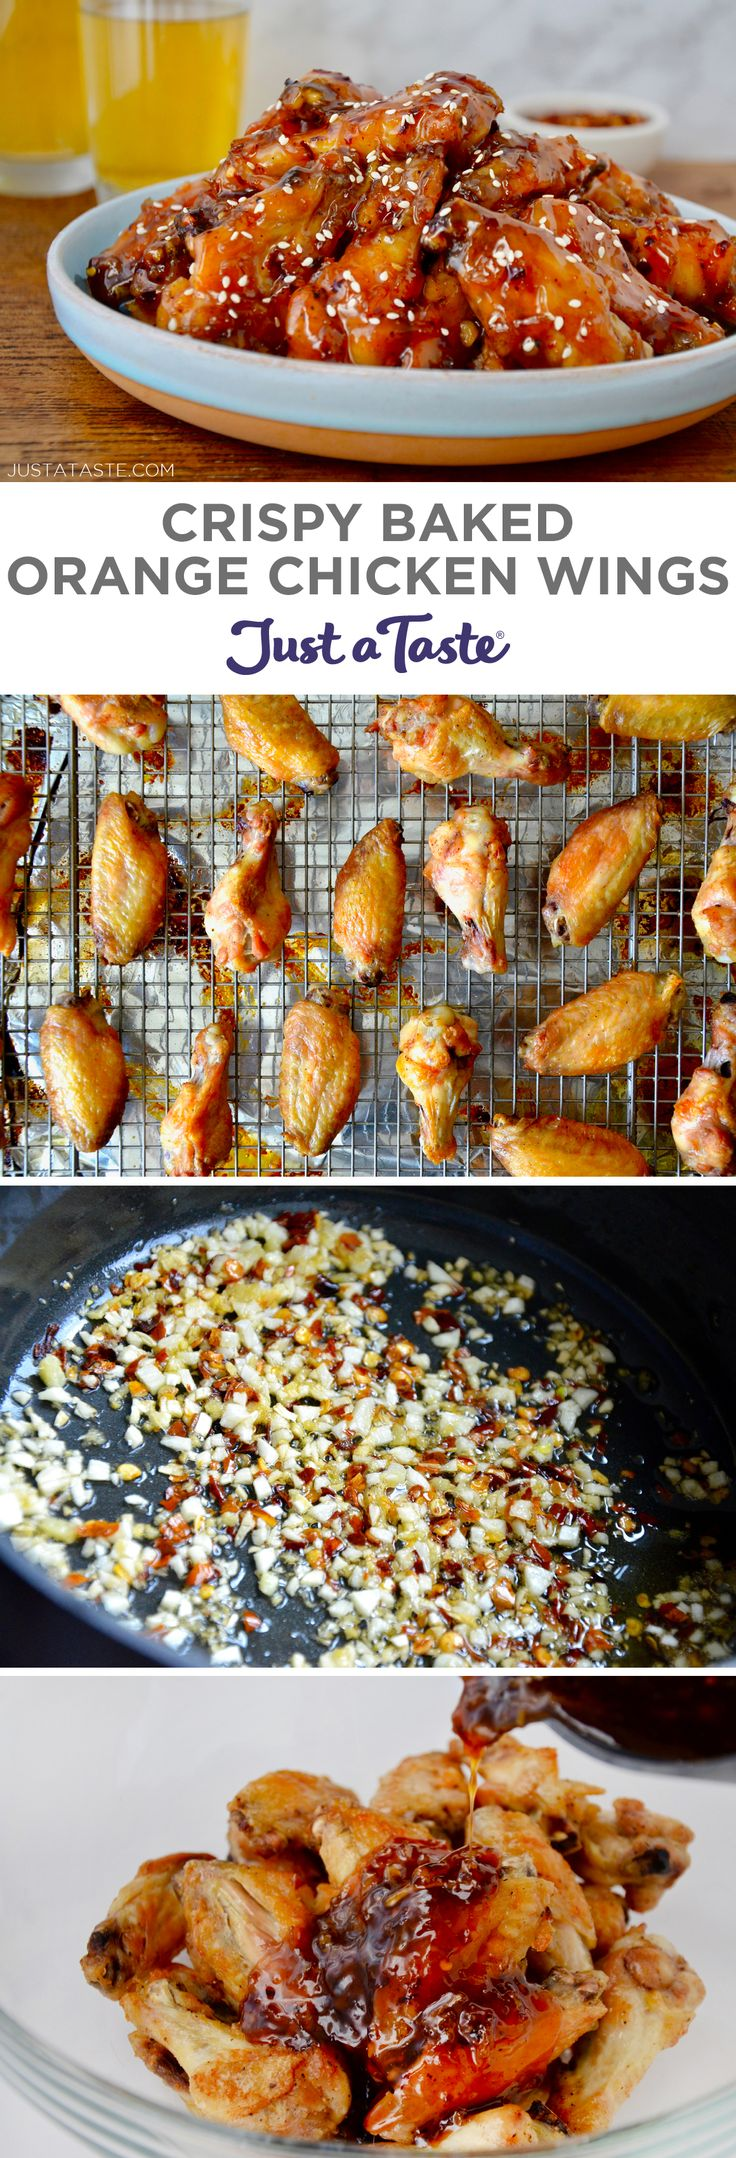 Crispy Baked Orange Chicken Wings recipe from justataste.com #recipe #appetizer #superbowl #healthyrecipes